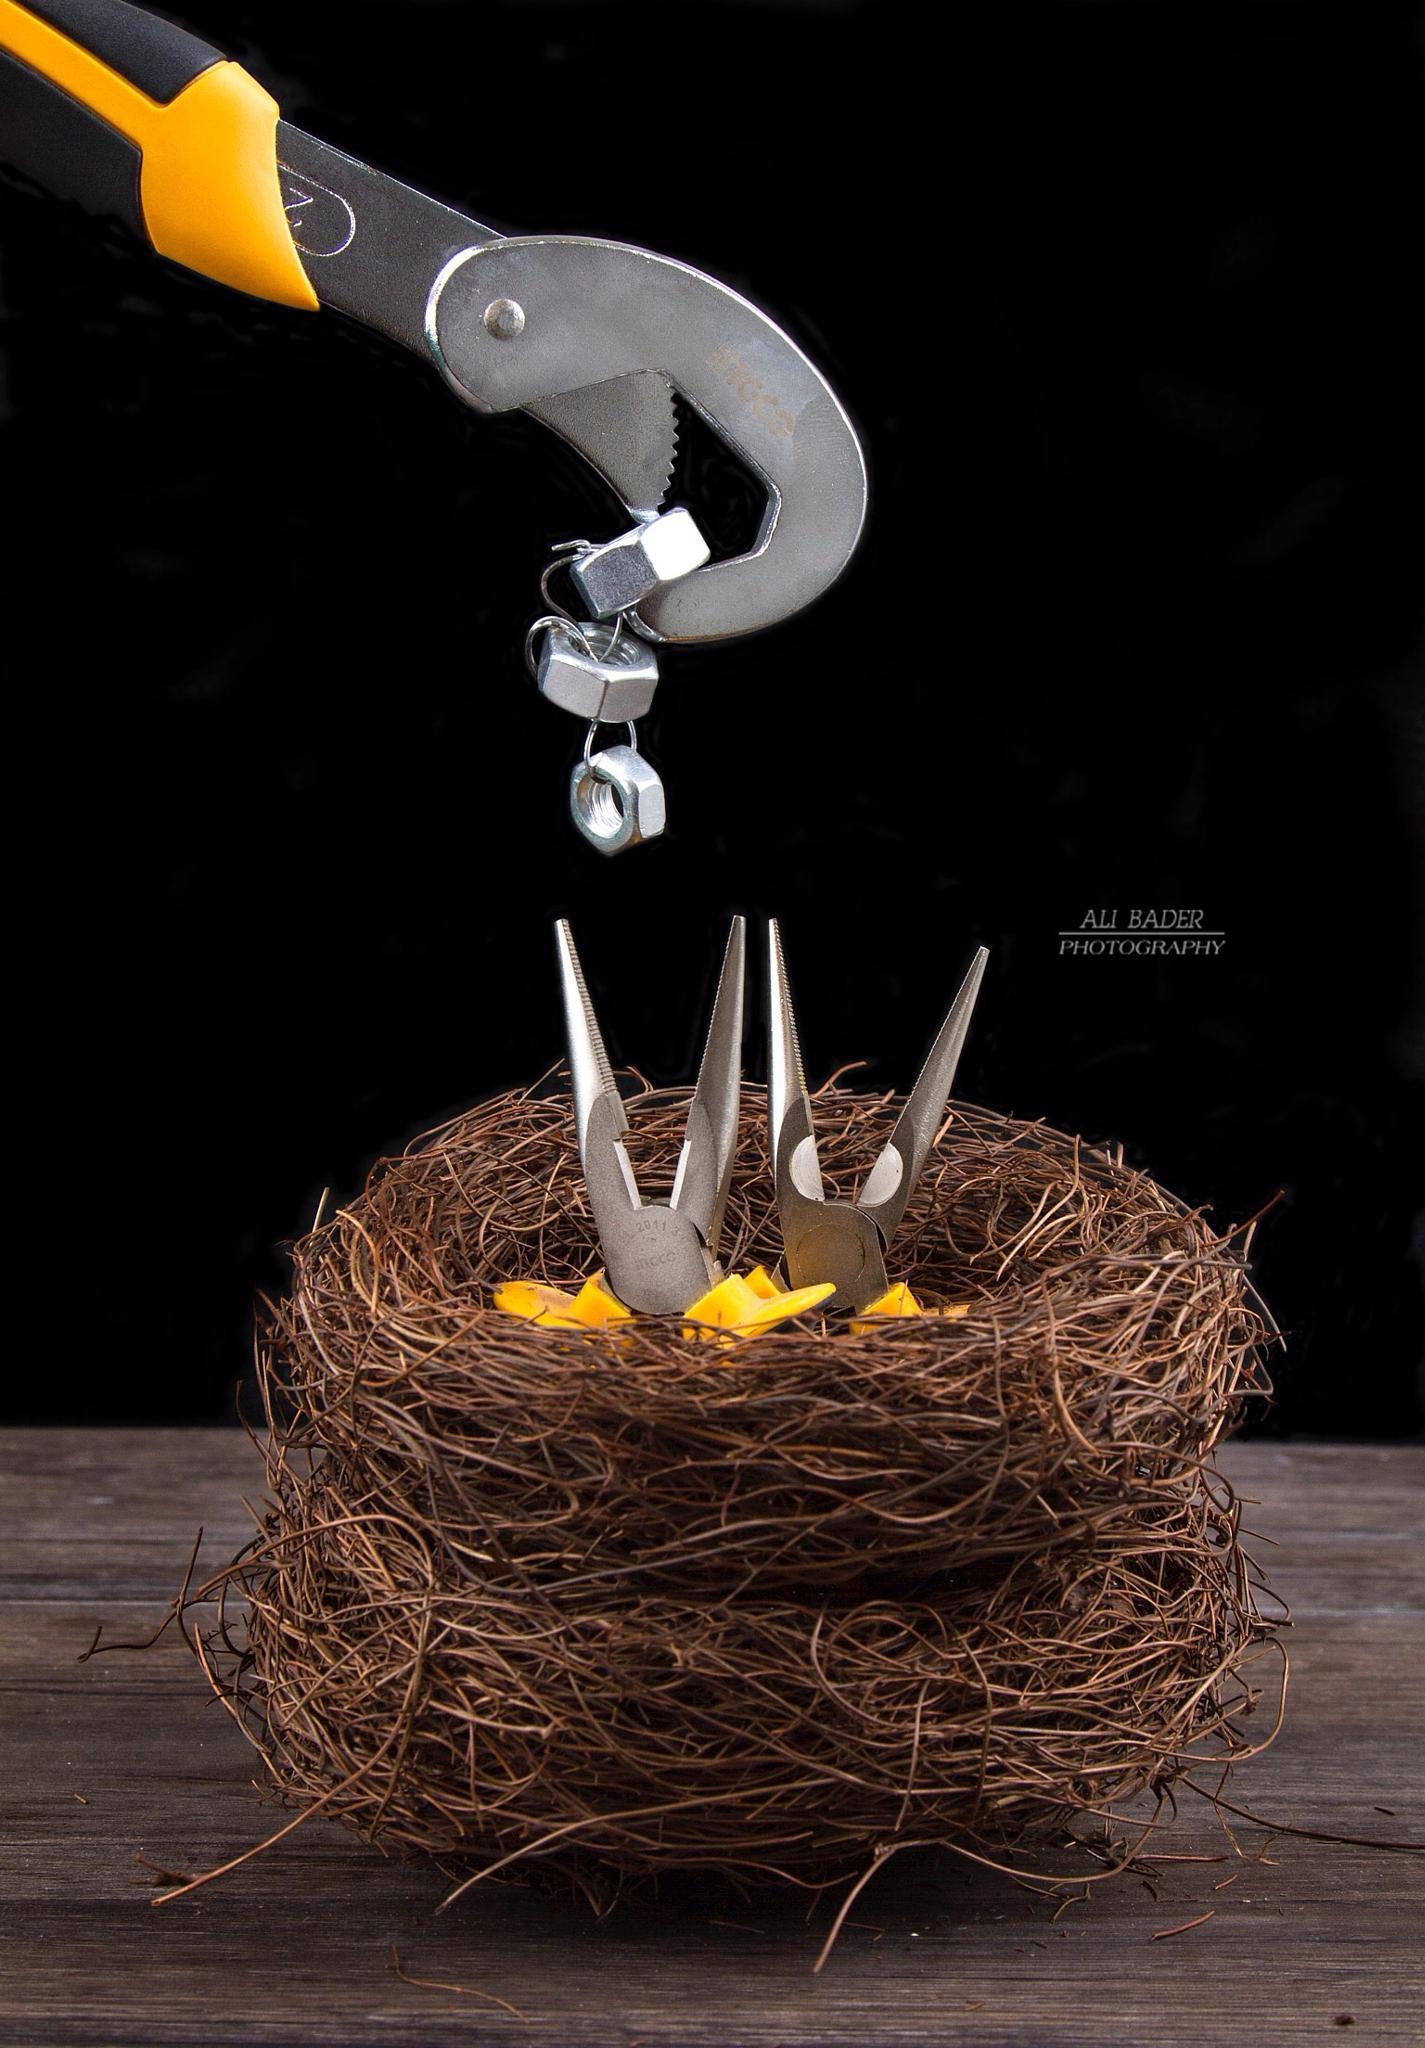 hungry by Ali Bader